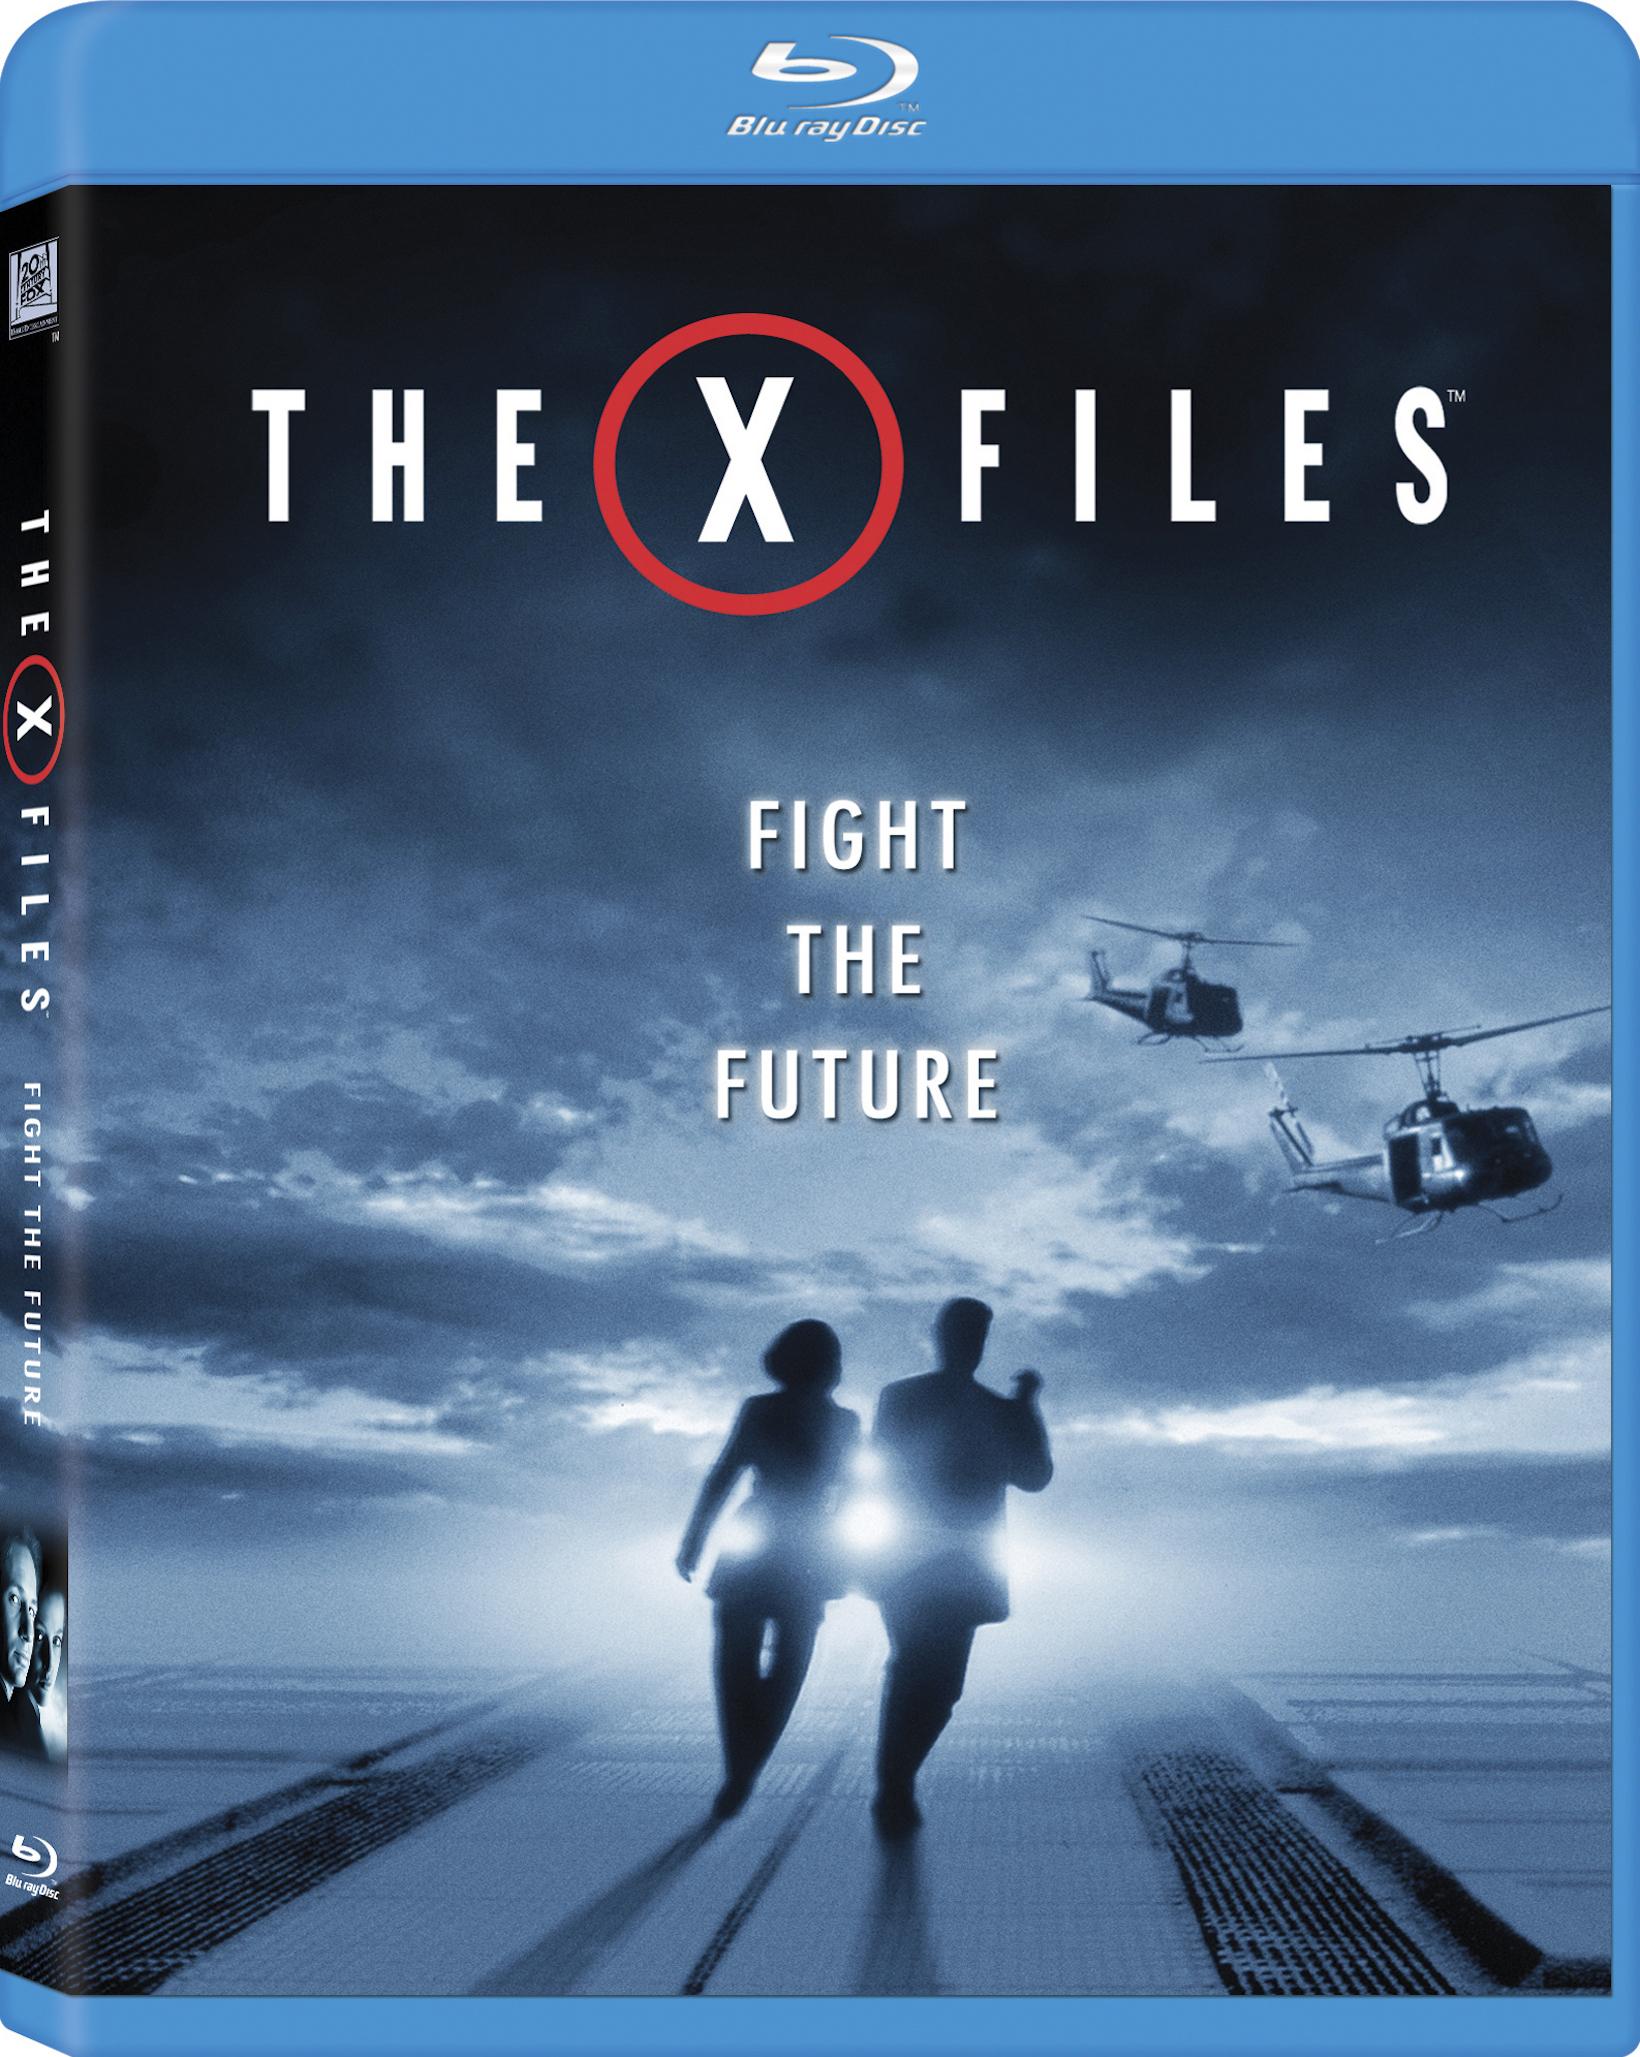 The X Files Fight The Future Blooper Reel Video 1998 Imdb